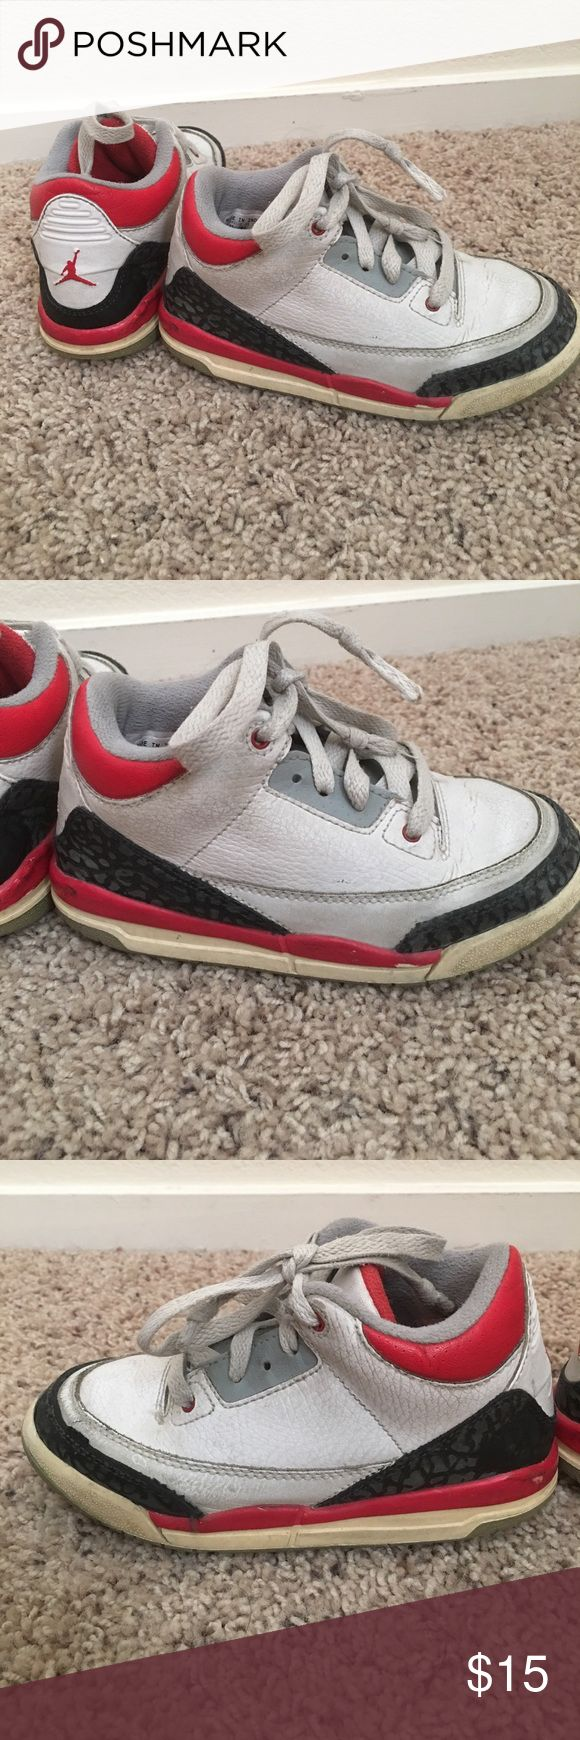 Jordans for kids Good condition. Still have life! Jordan Shoes Sneakers